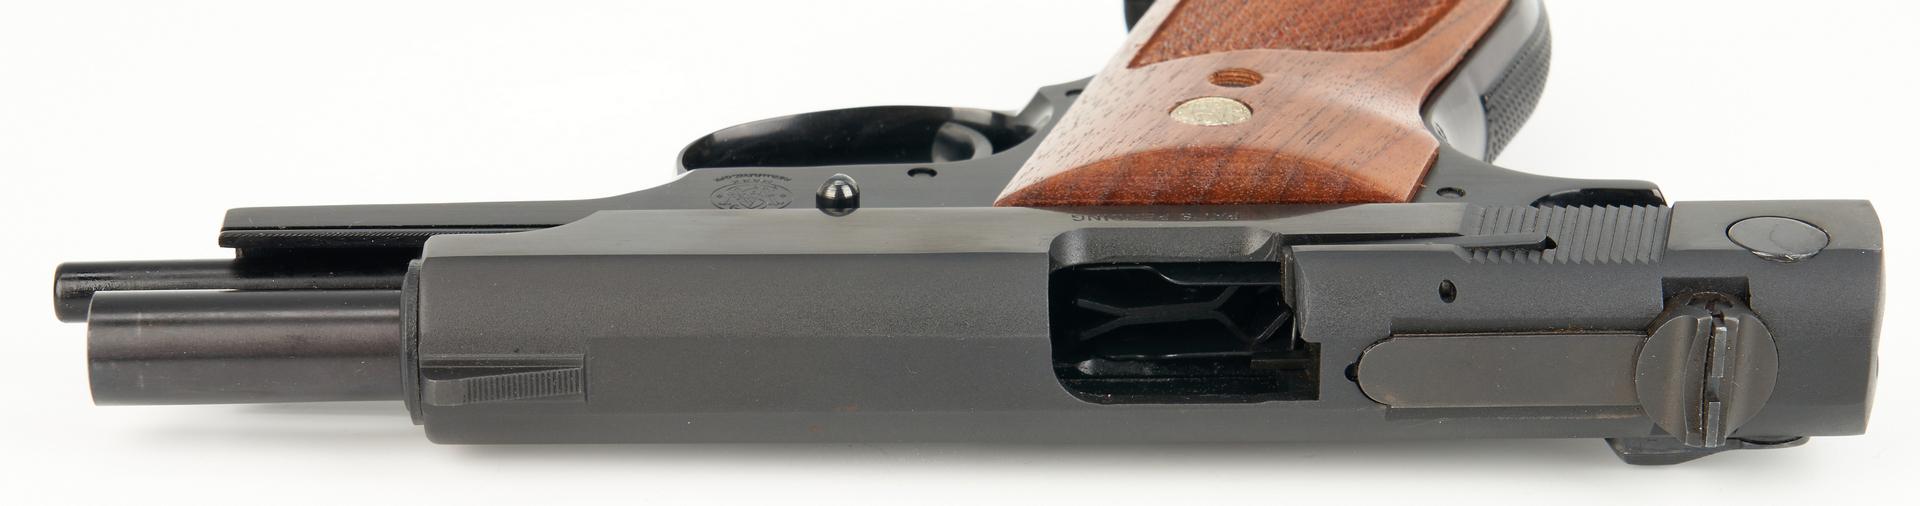 Lot 623: Boxed Smith & Wesson Pistol Model 39-2 plus Colt Commander Lightweight